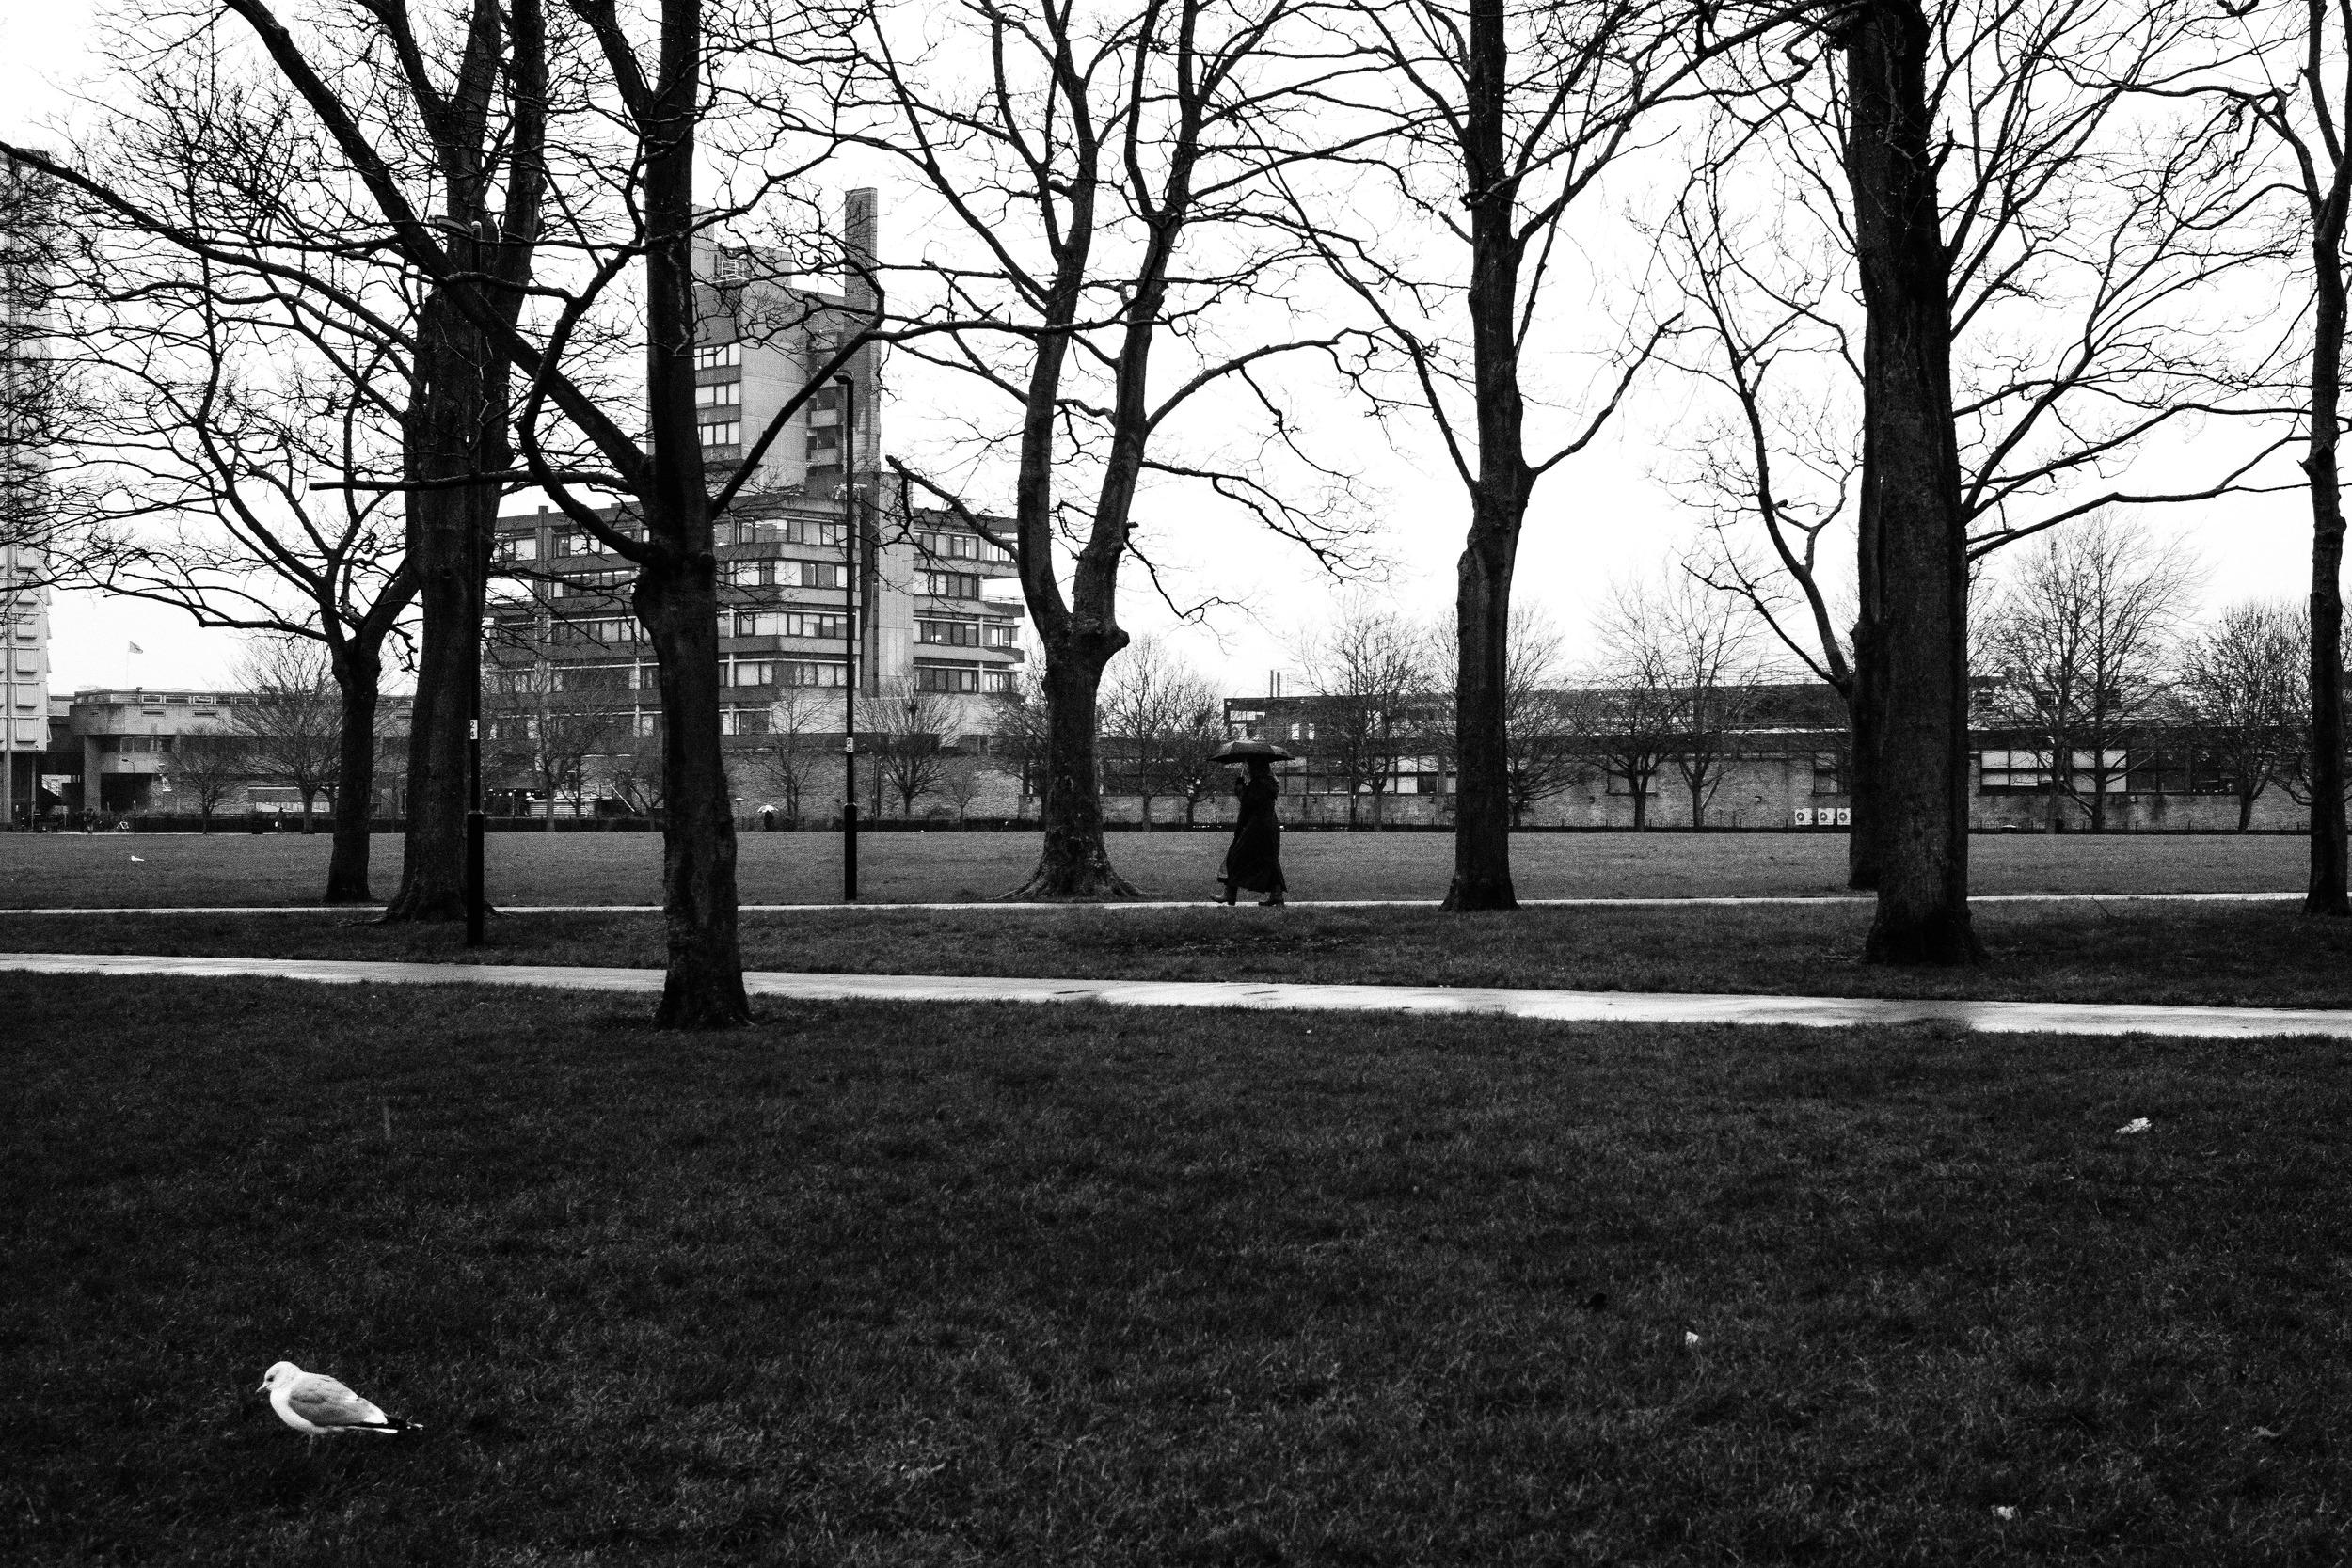 Leicester - Victoria Park